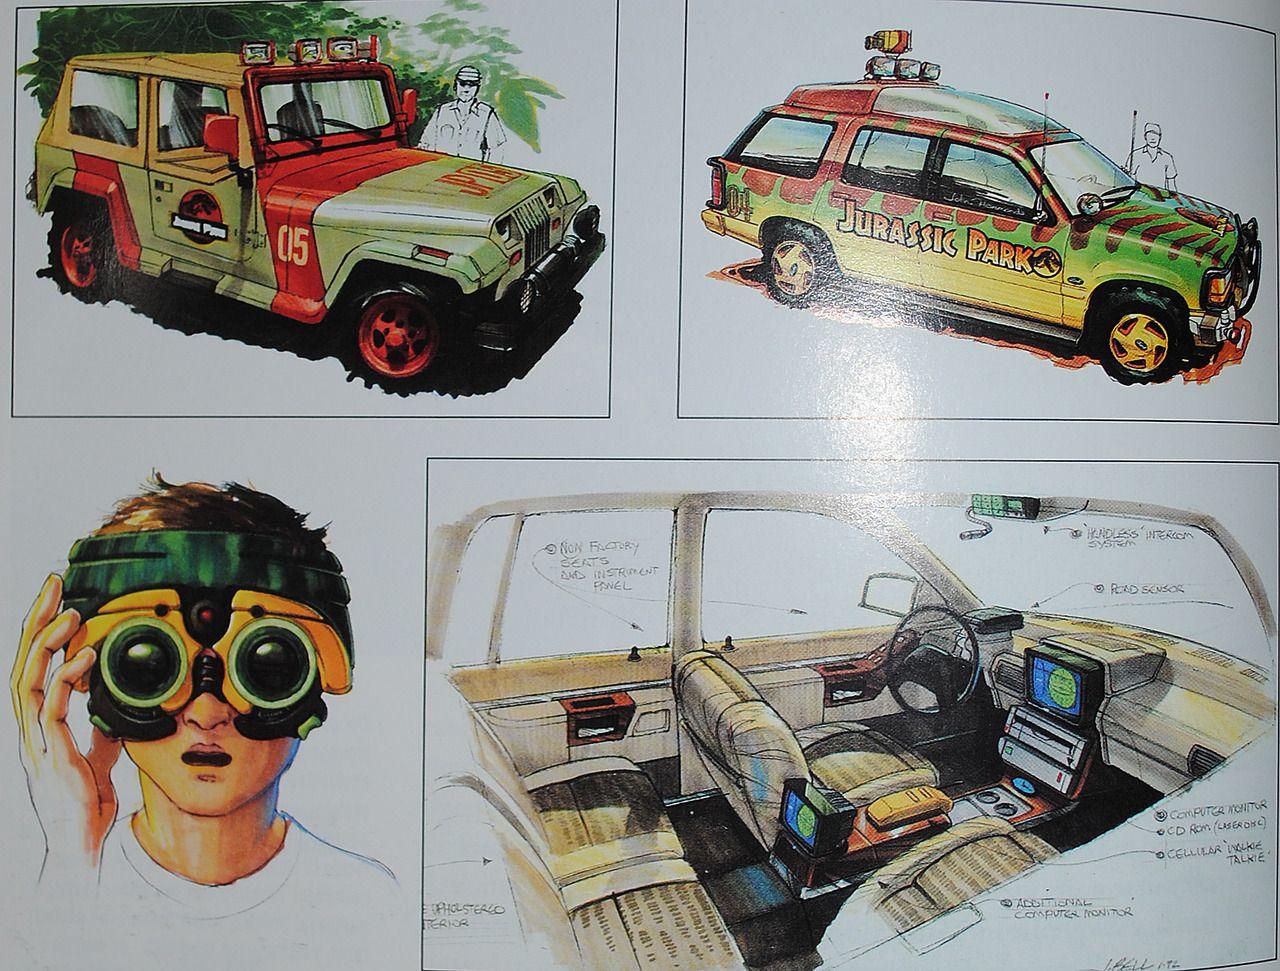 Jurassic park card 3 by chicagocubsfan24 on deviantart - Jurassiraptor Jurassic Park Vehicle Concept Art By John Bell